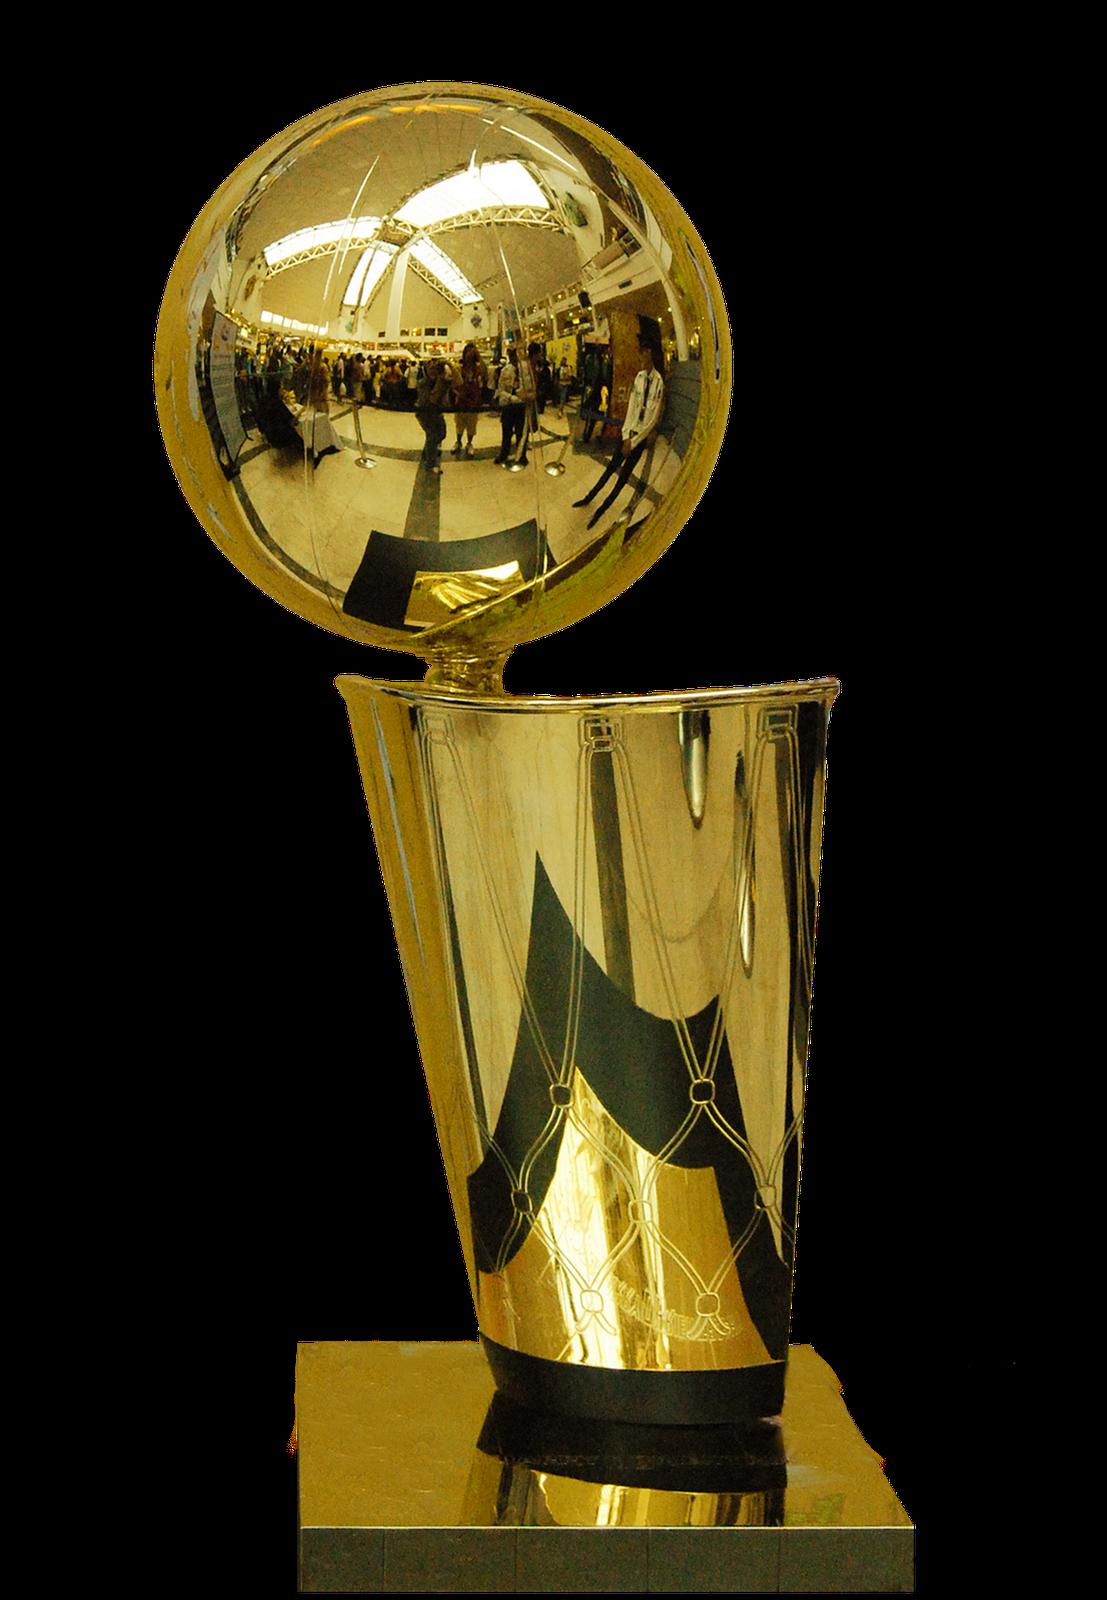 Troféu da NBA. | COŚ | Pinterest | Sports trophies, Nba championships and NBA